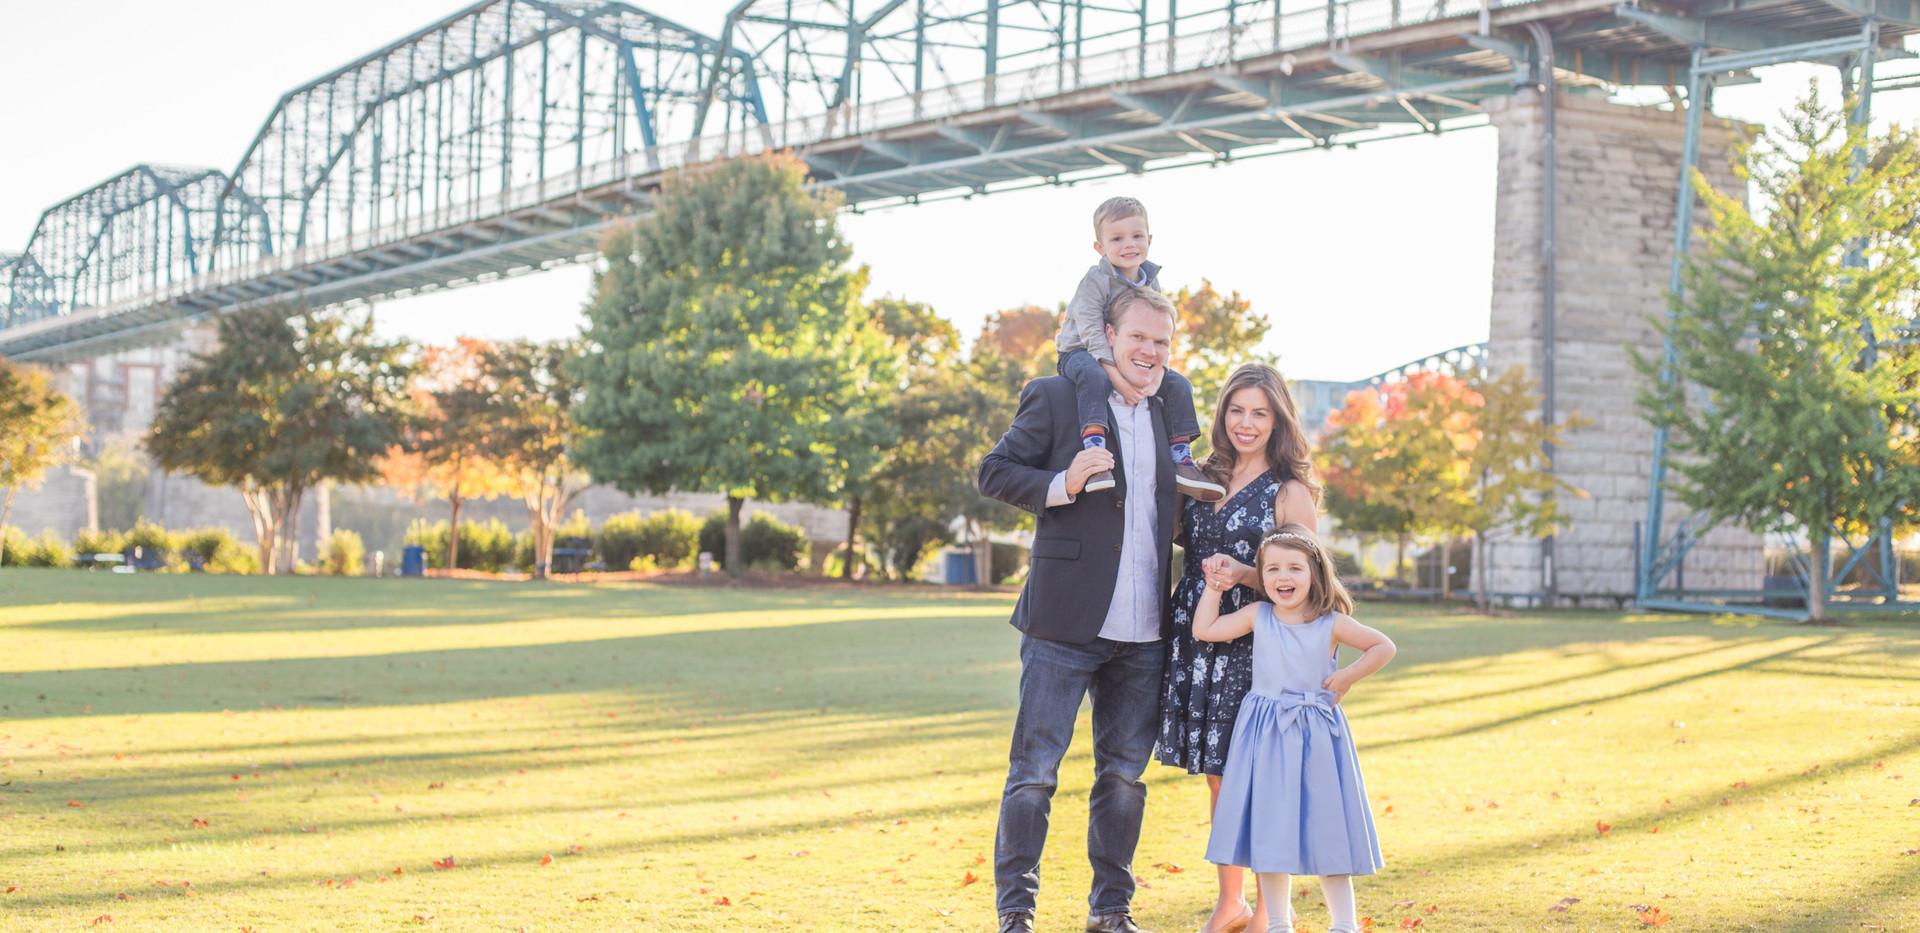 Walnut Street Bridge family photos, Chattanooga family photographer